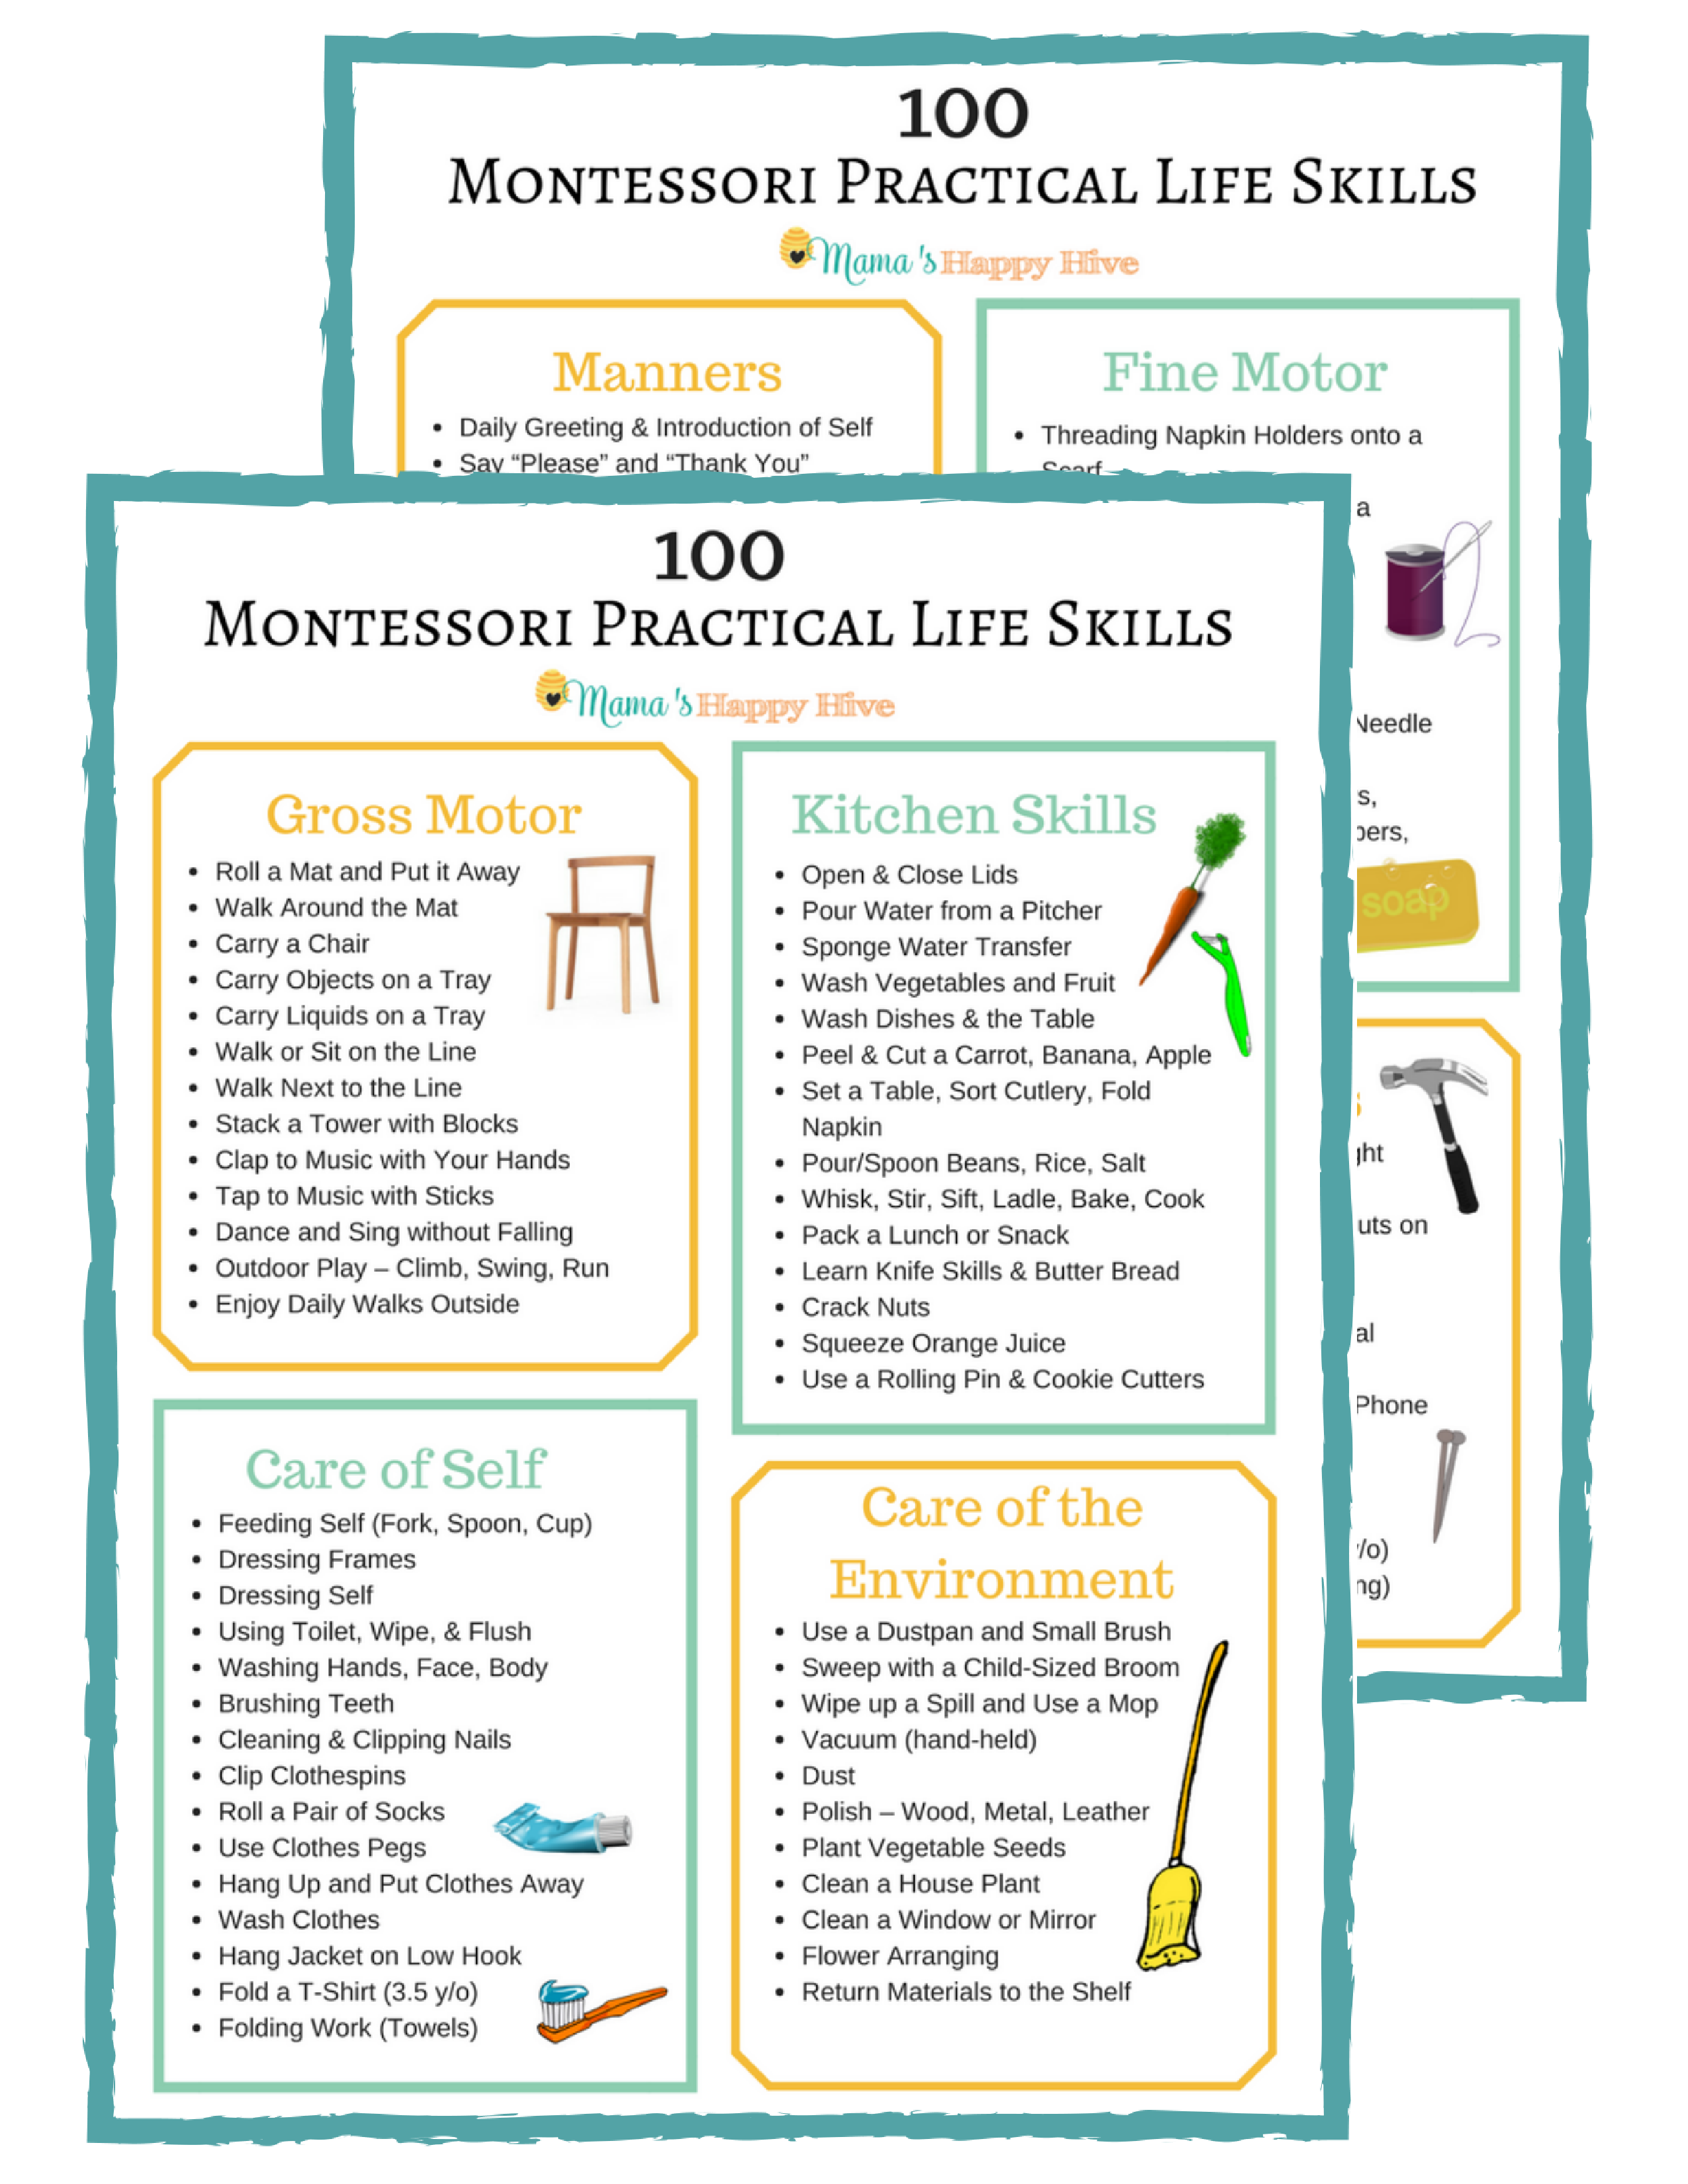 Fall Harvest Recipes Montessori Style